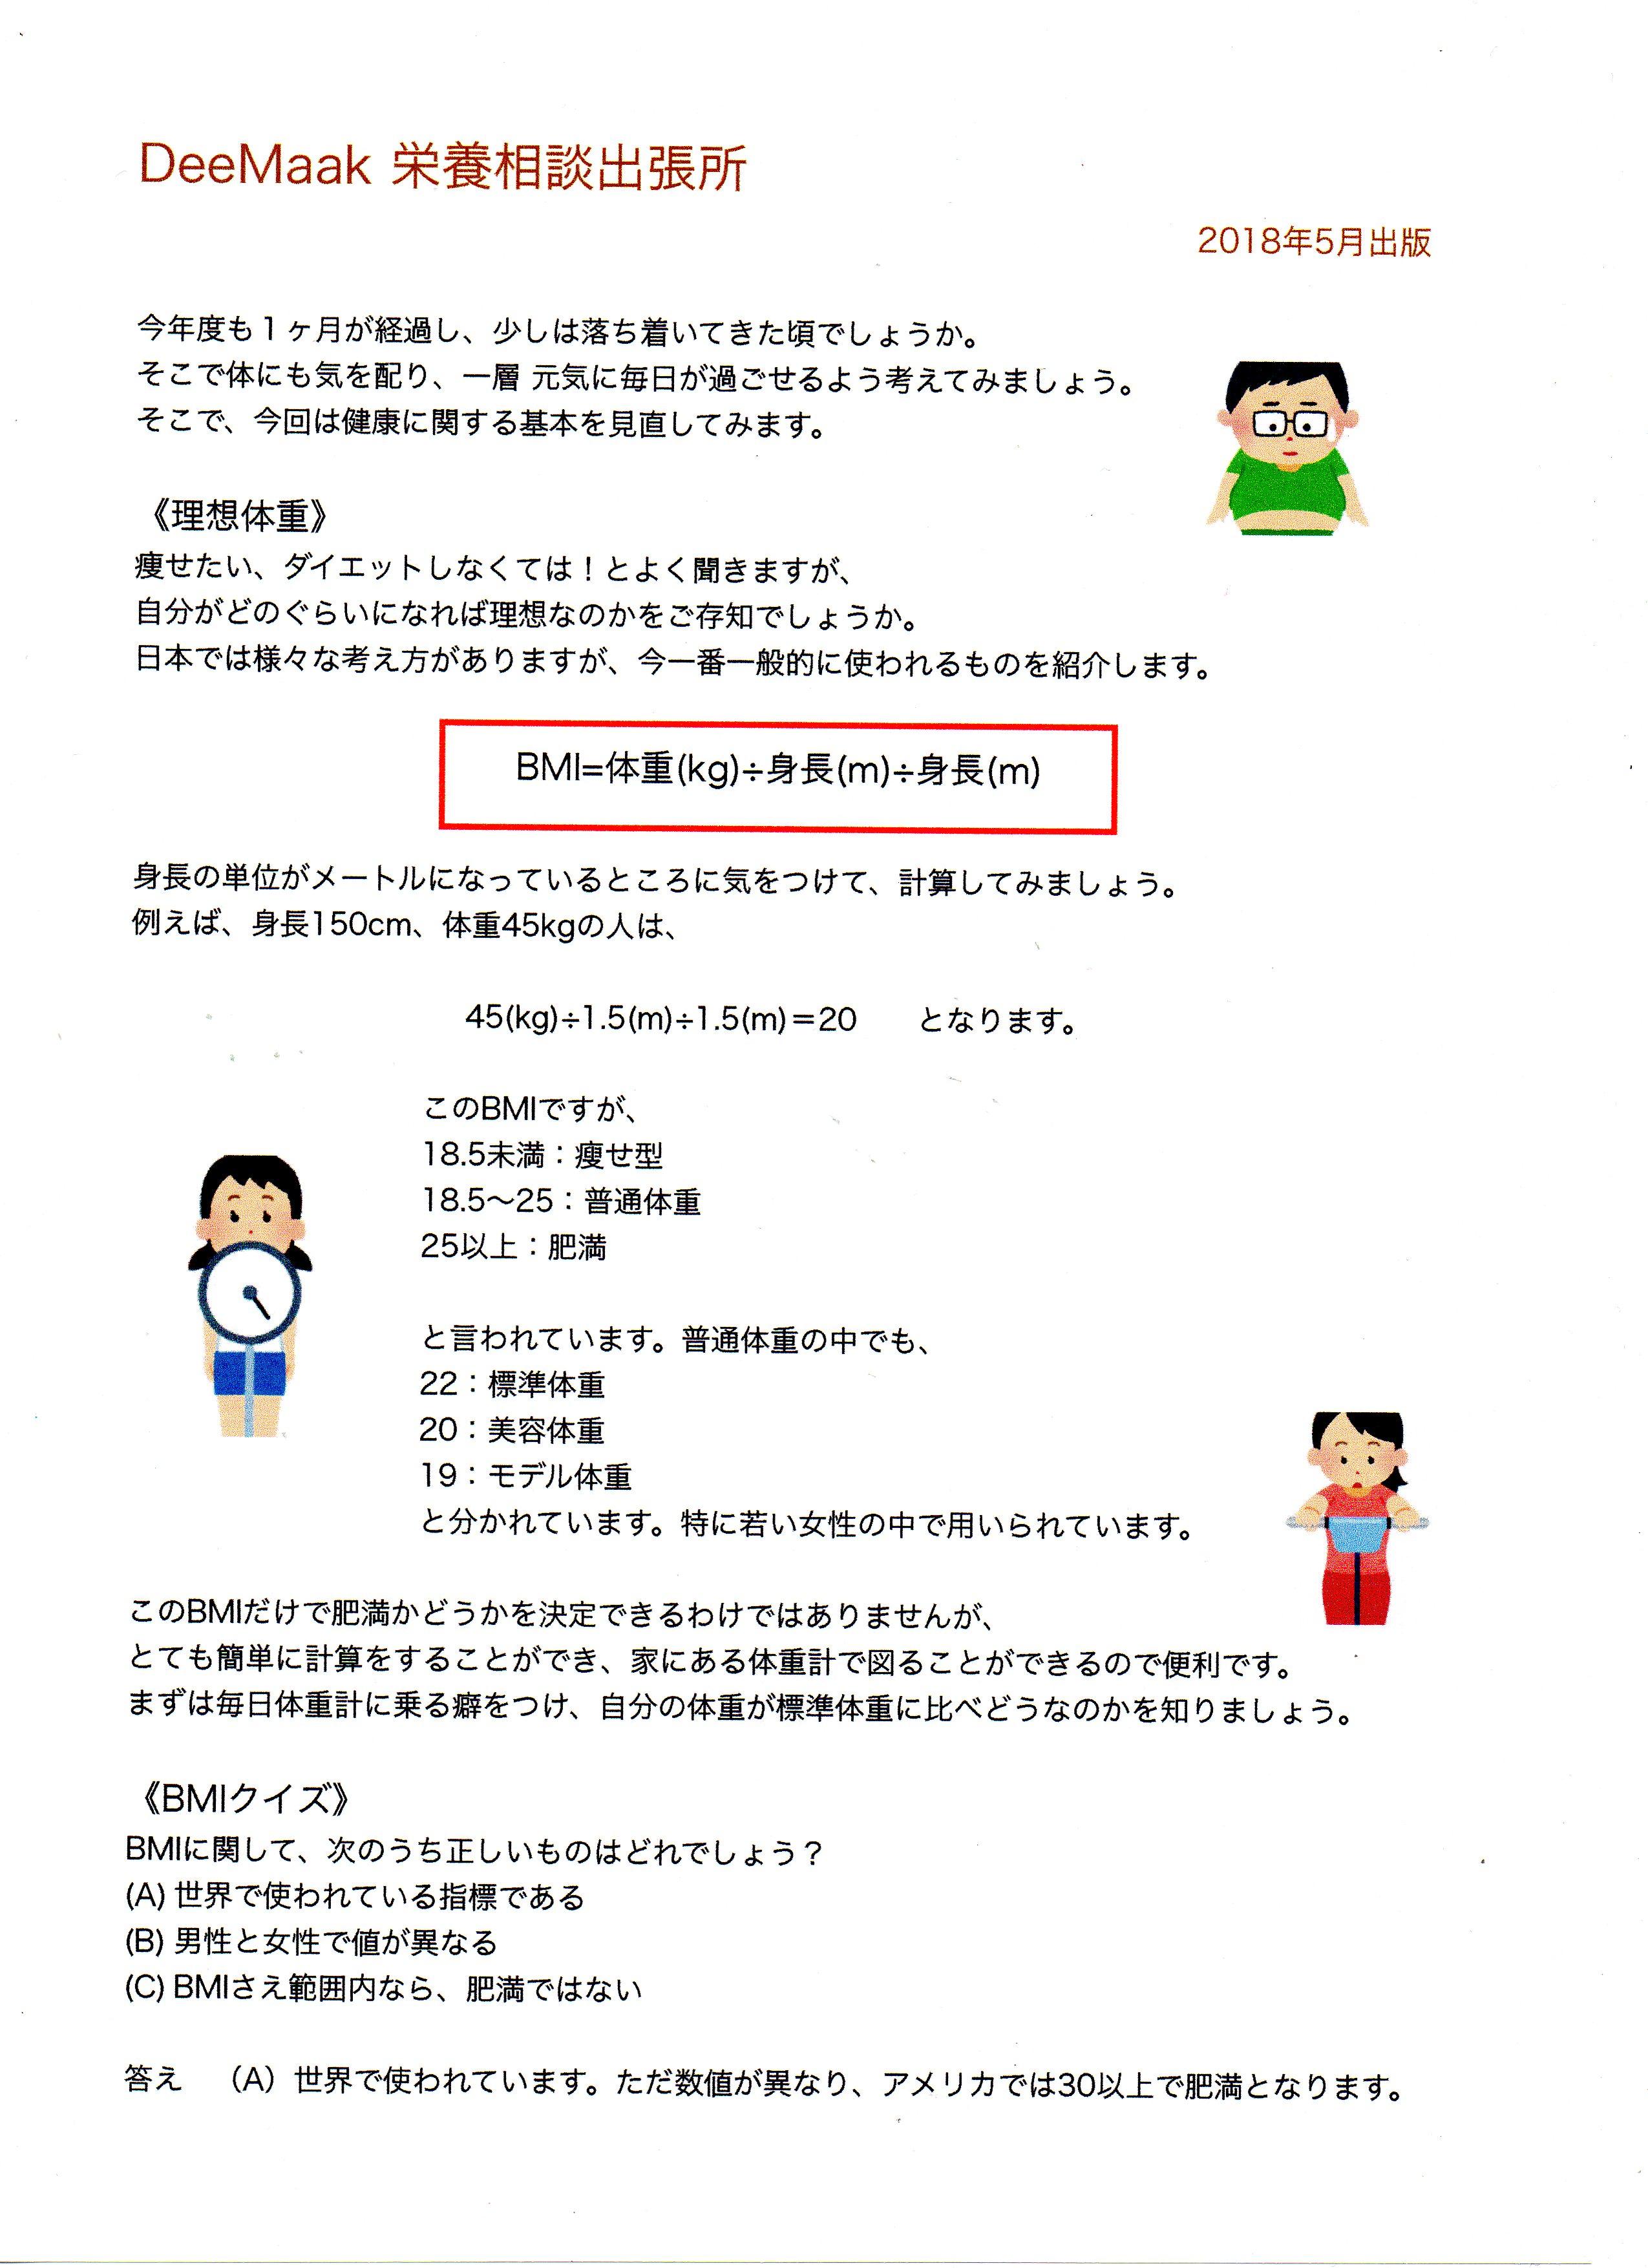 deemaak栄養相談室201805-1